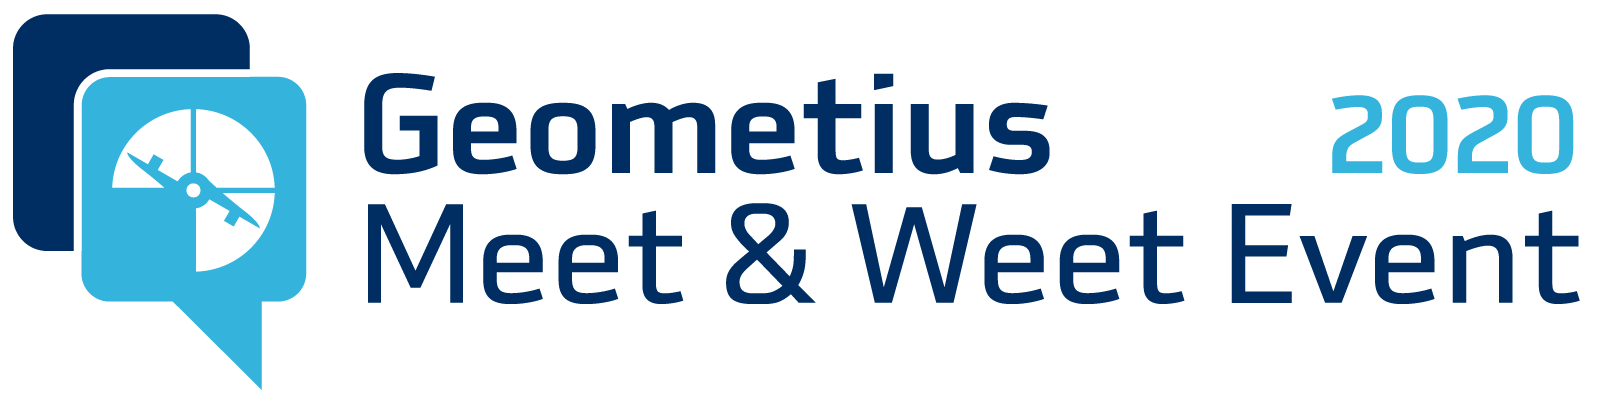 Geometius Meet & Weet Event